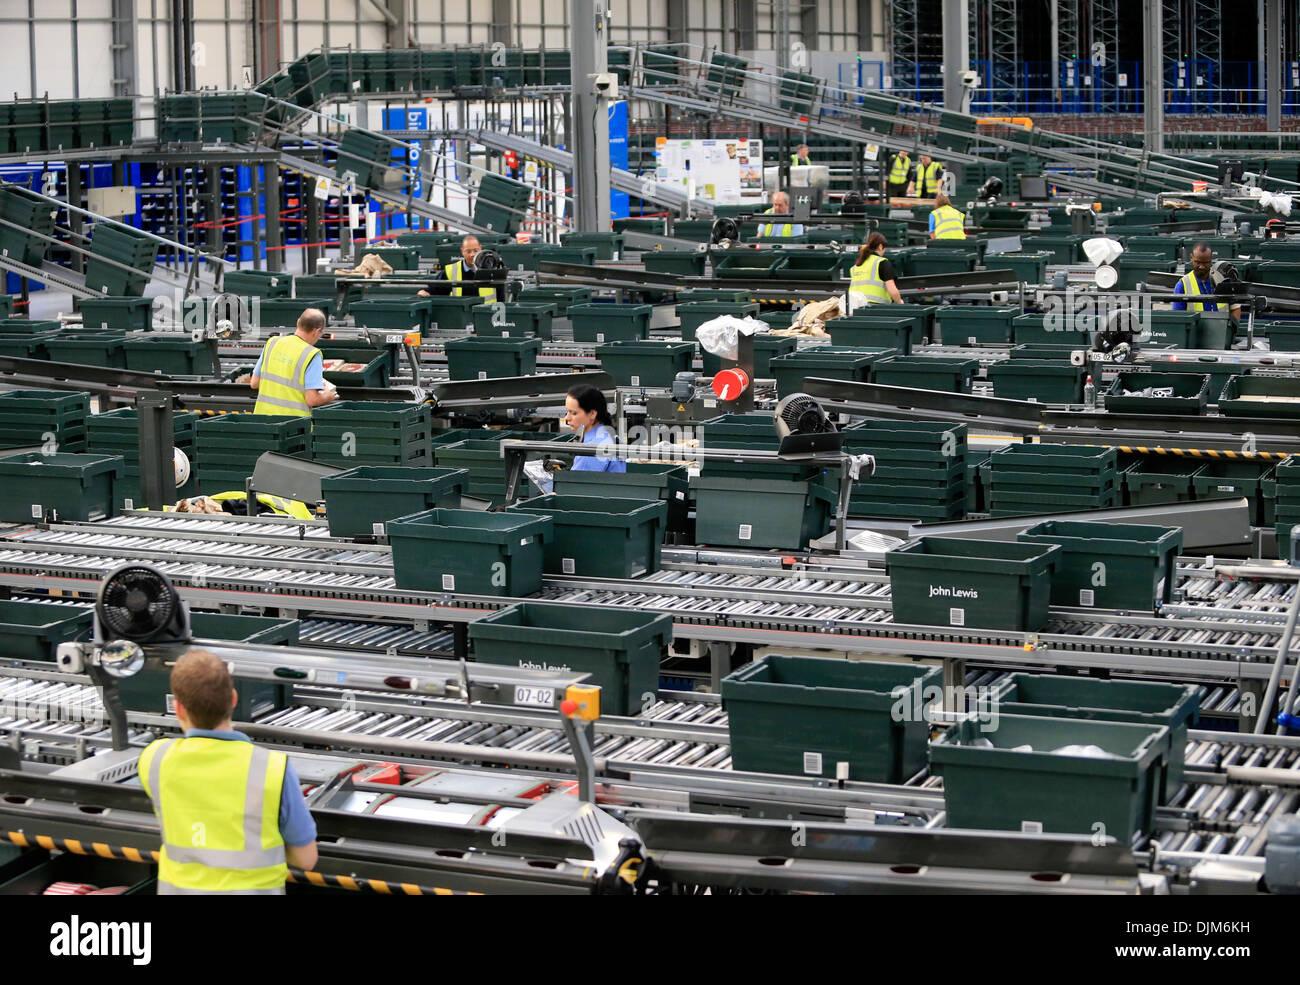 John Lewis distribution centre Milton Keynes December 2013